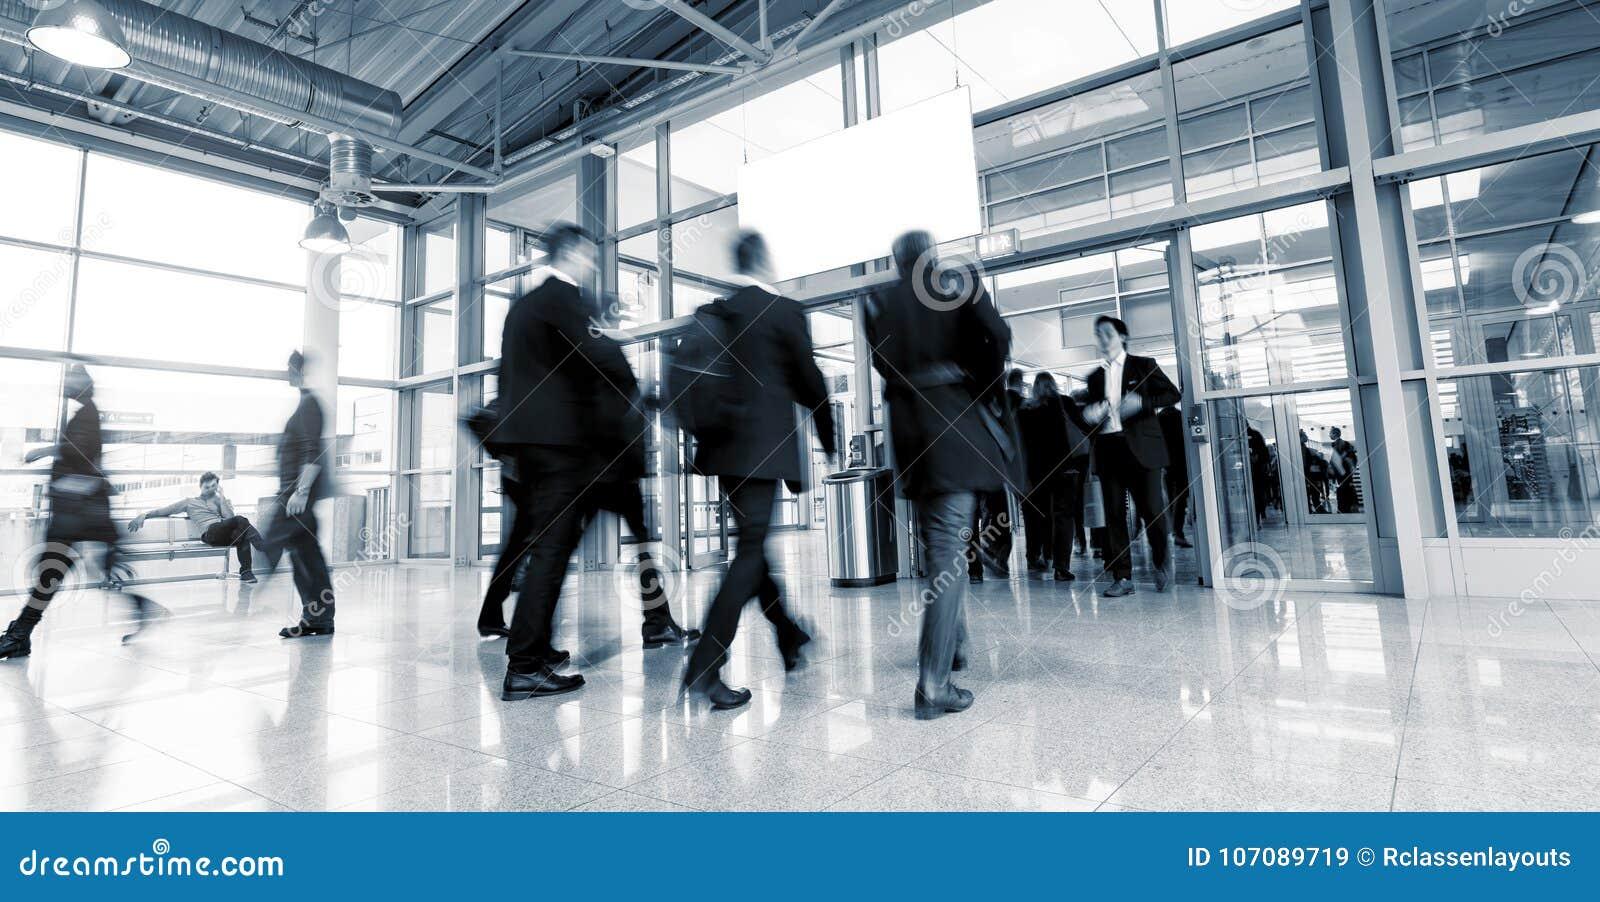 Hauptverkehrszeit an einem europäischen Tradeshoweingang